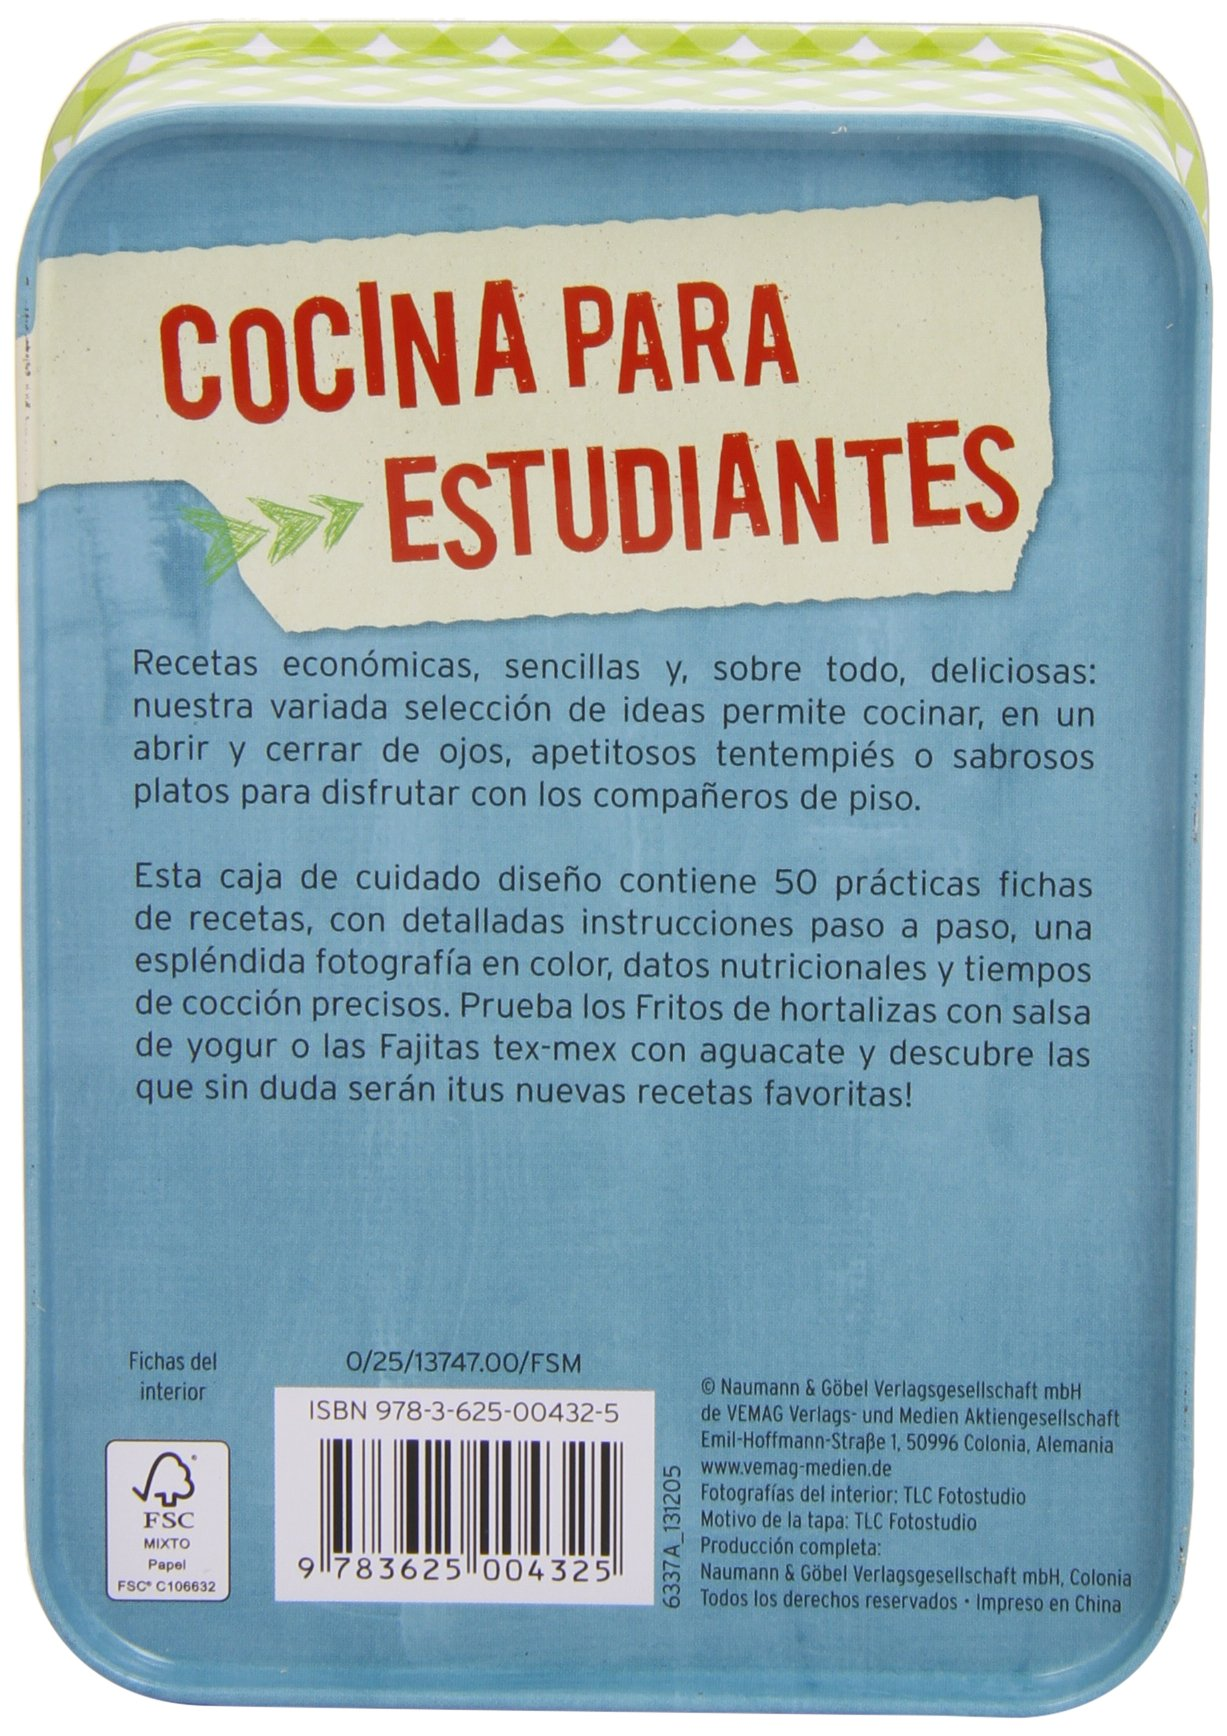 COCINA PARA ESTUDIANTES.(CAJAS DE RECETAS): NGV: 9783625004325: Amazon.com: Books